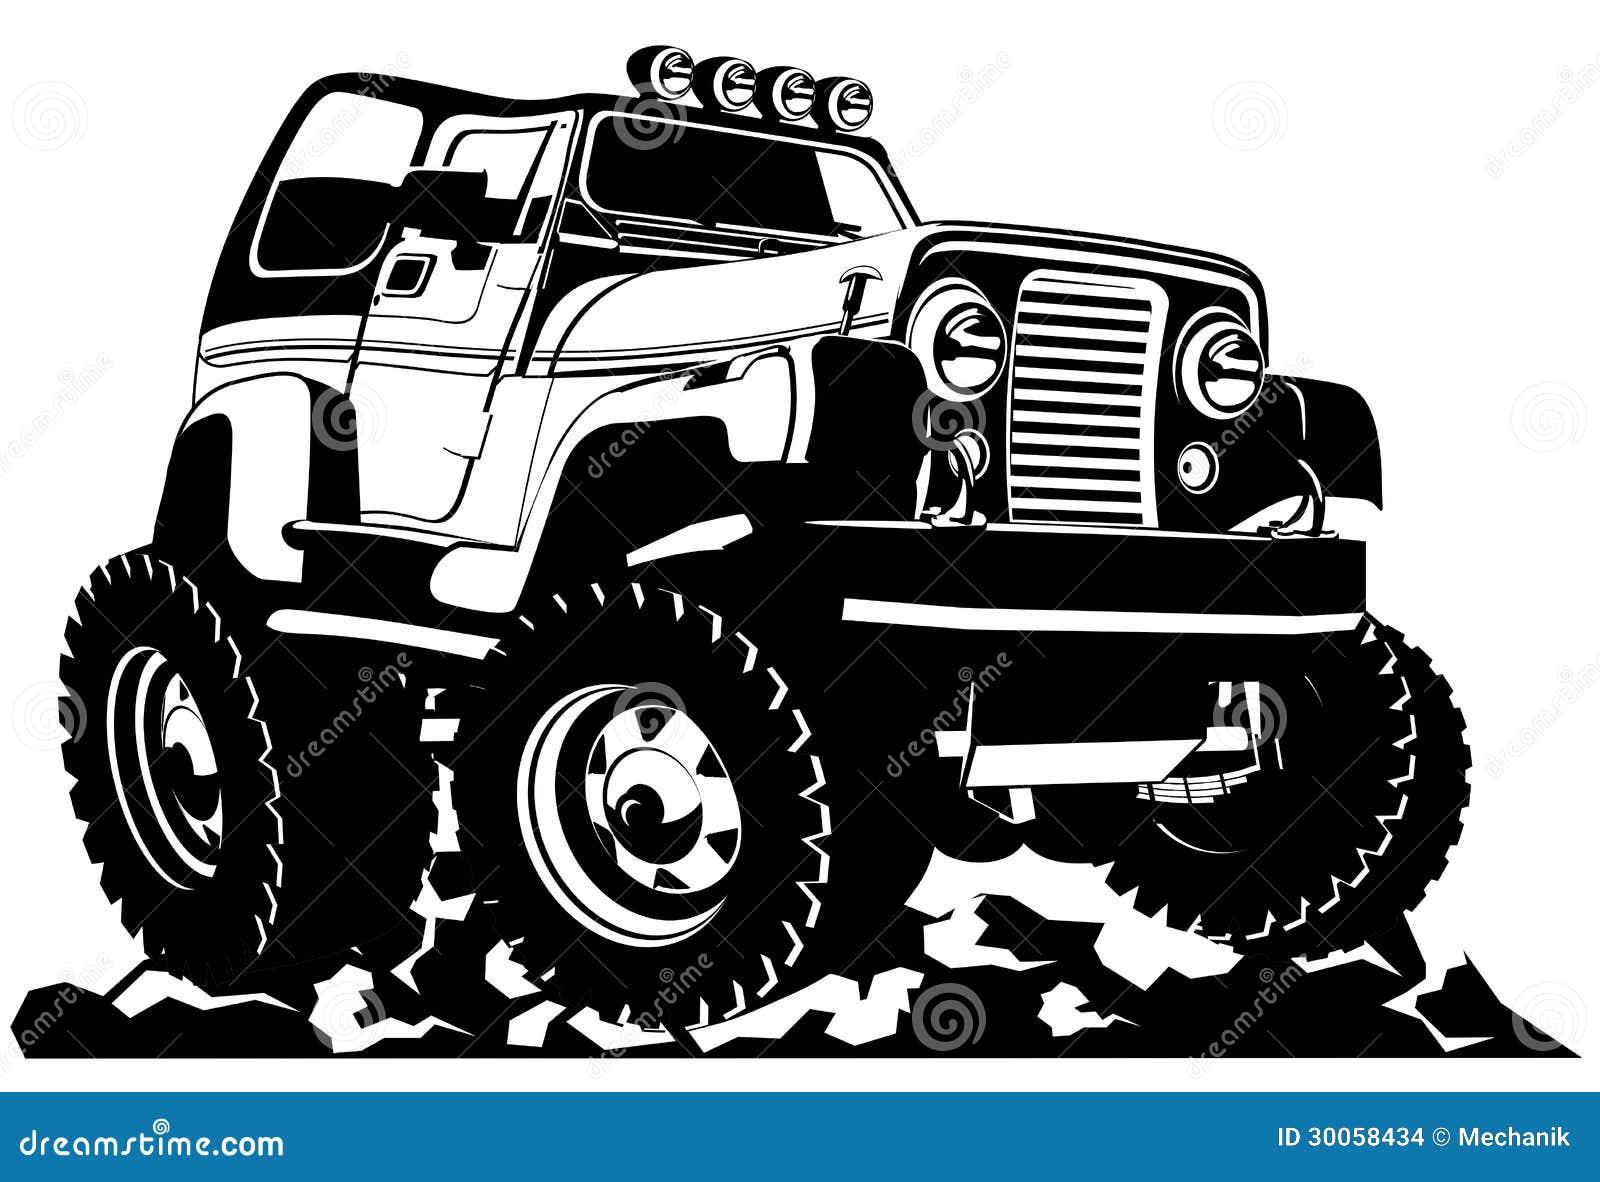 Jeep Hoodies Cartoon Jeep Stock Images - Image: 30058434